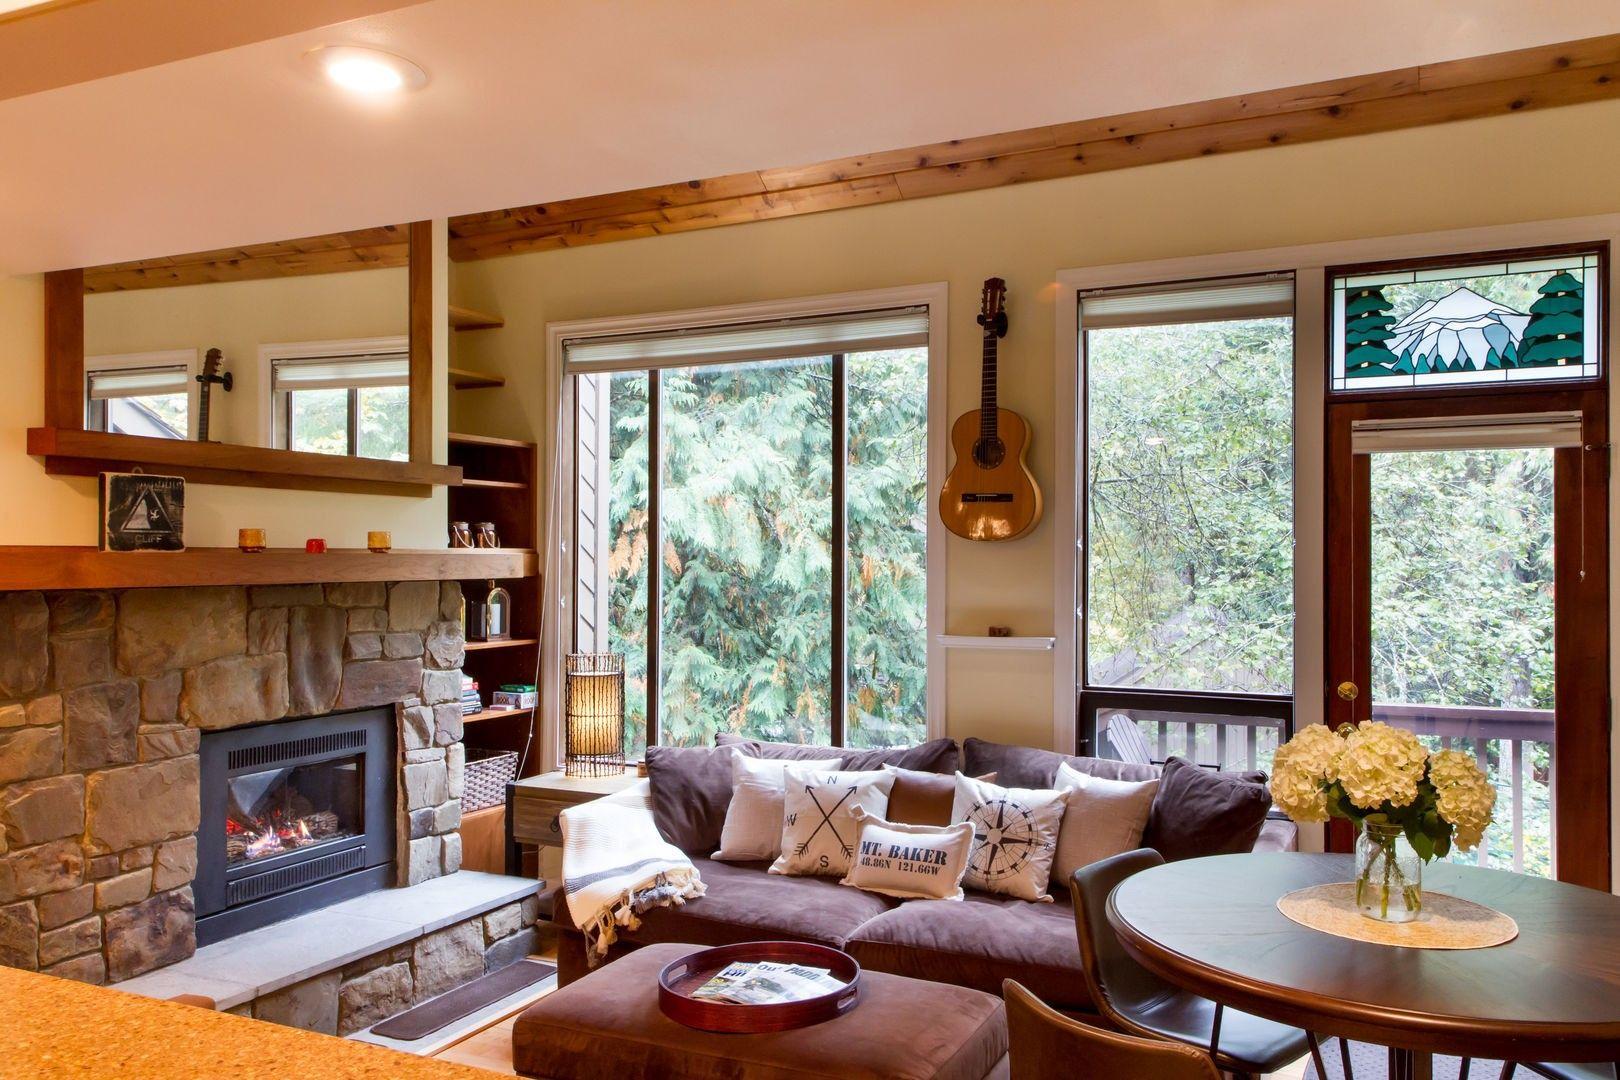 Pin By Luxury Getaways On Snowater Rivers Edge Luxury Getaway Common Area River Edge